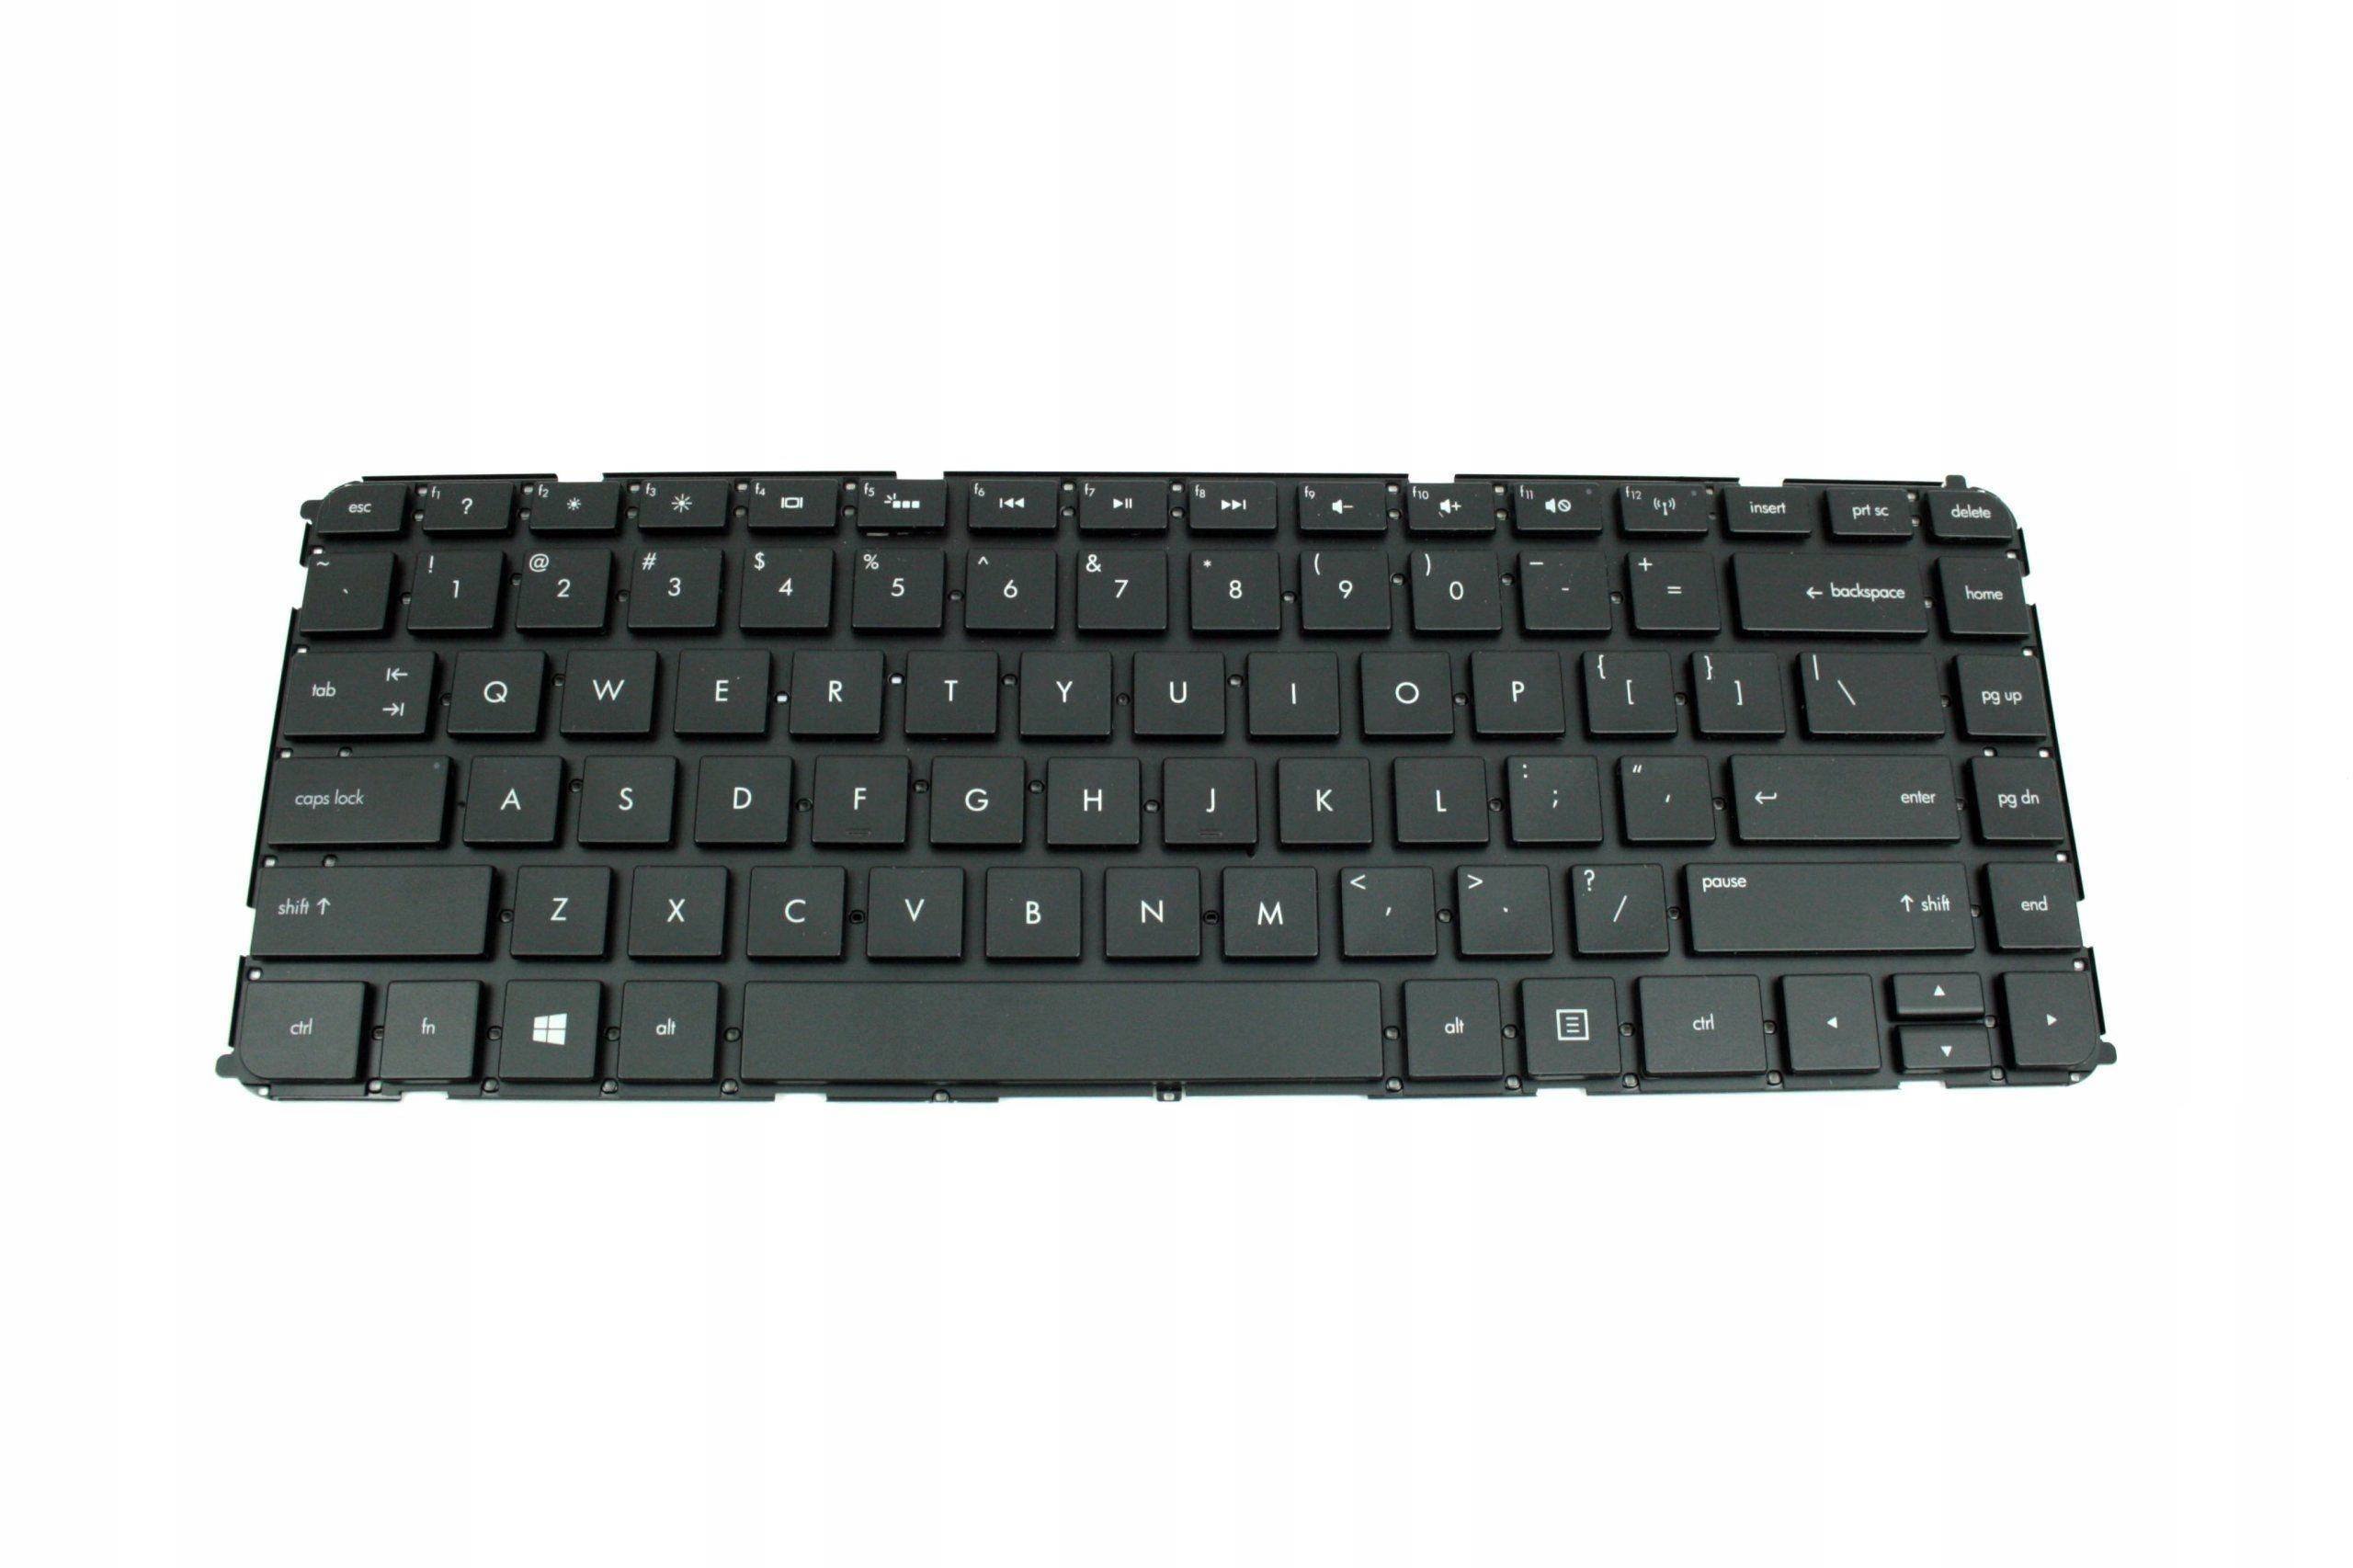 KLAWIATURA HP ENVY 4 1000 1100 1200 1130EW 6 1000 - Klawiatury do laptopów